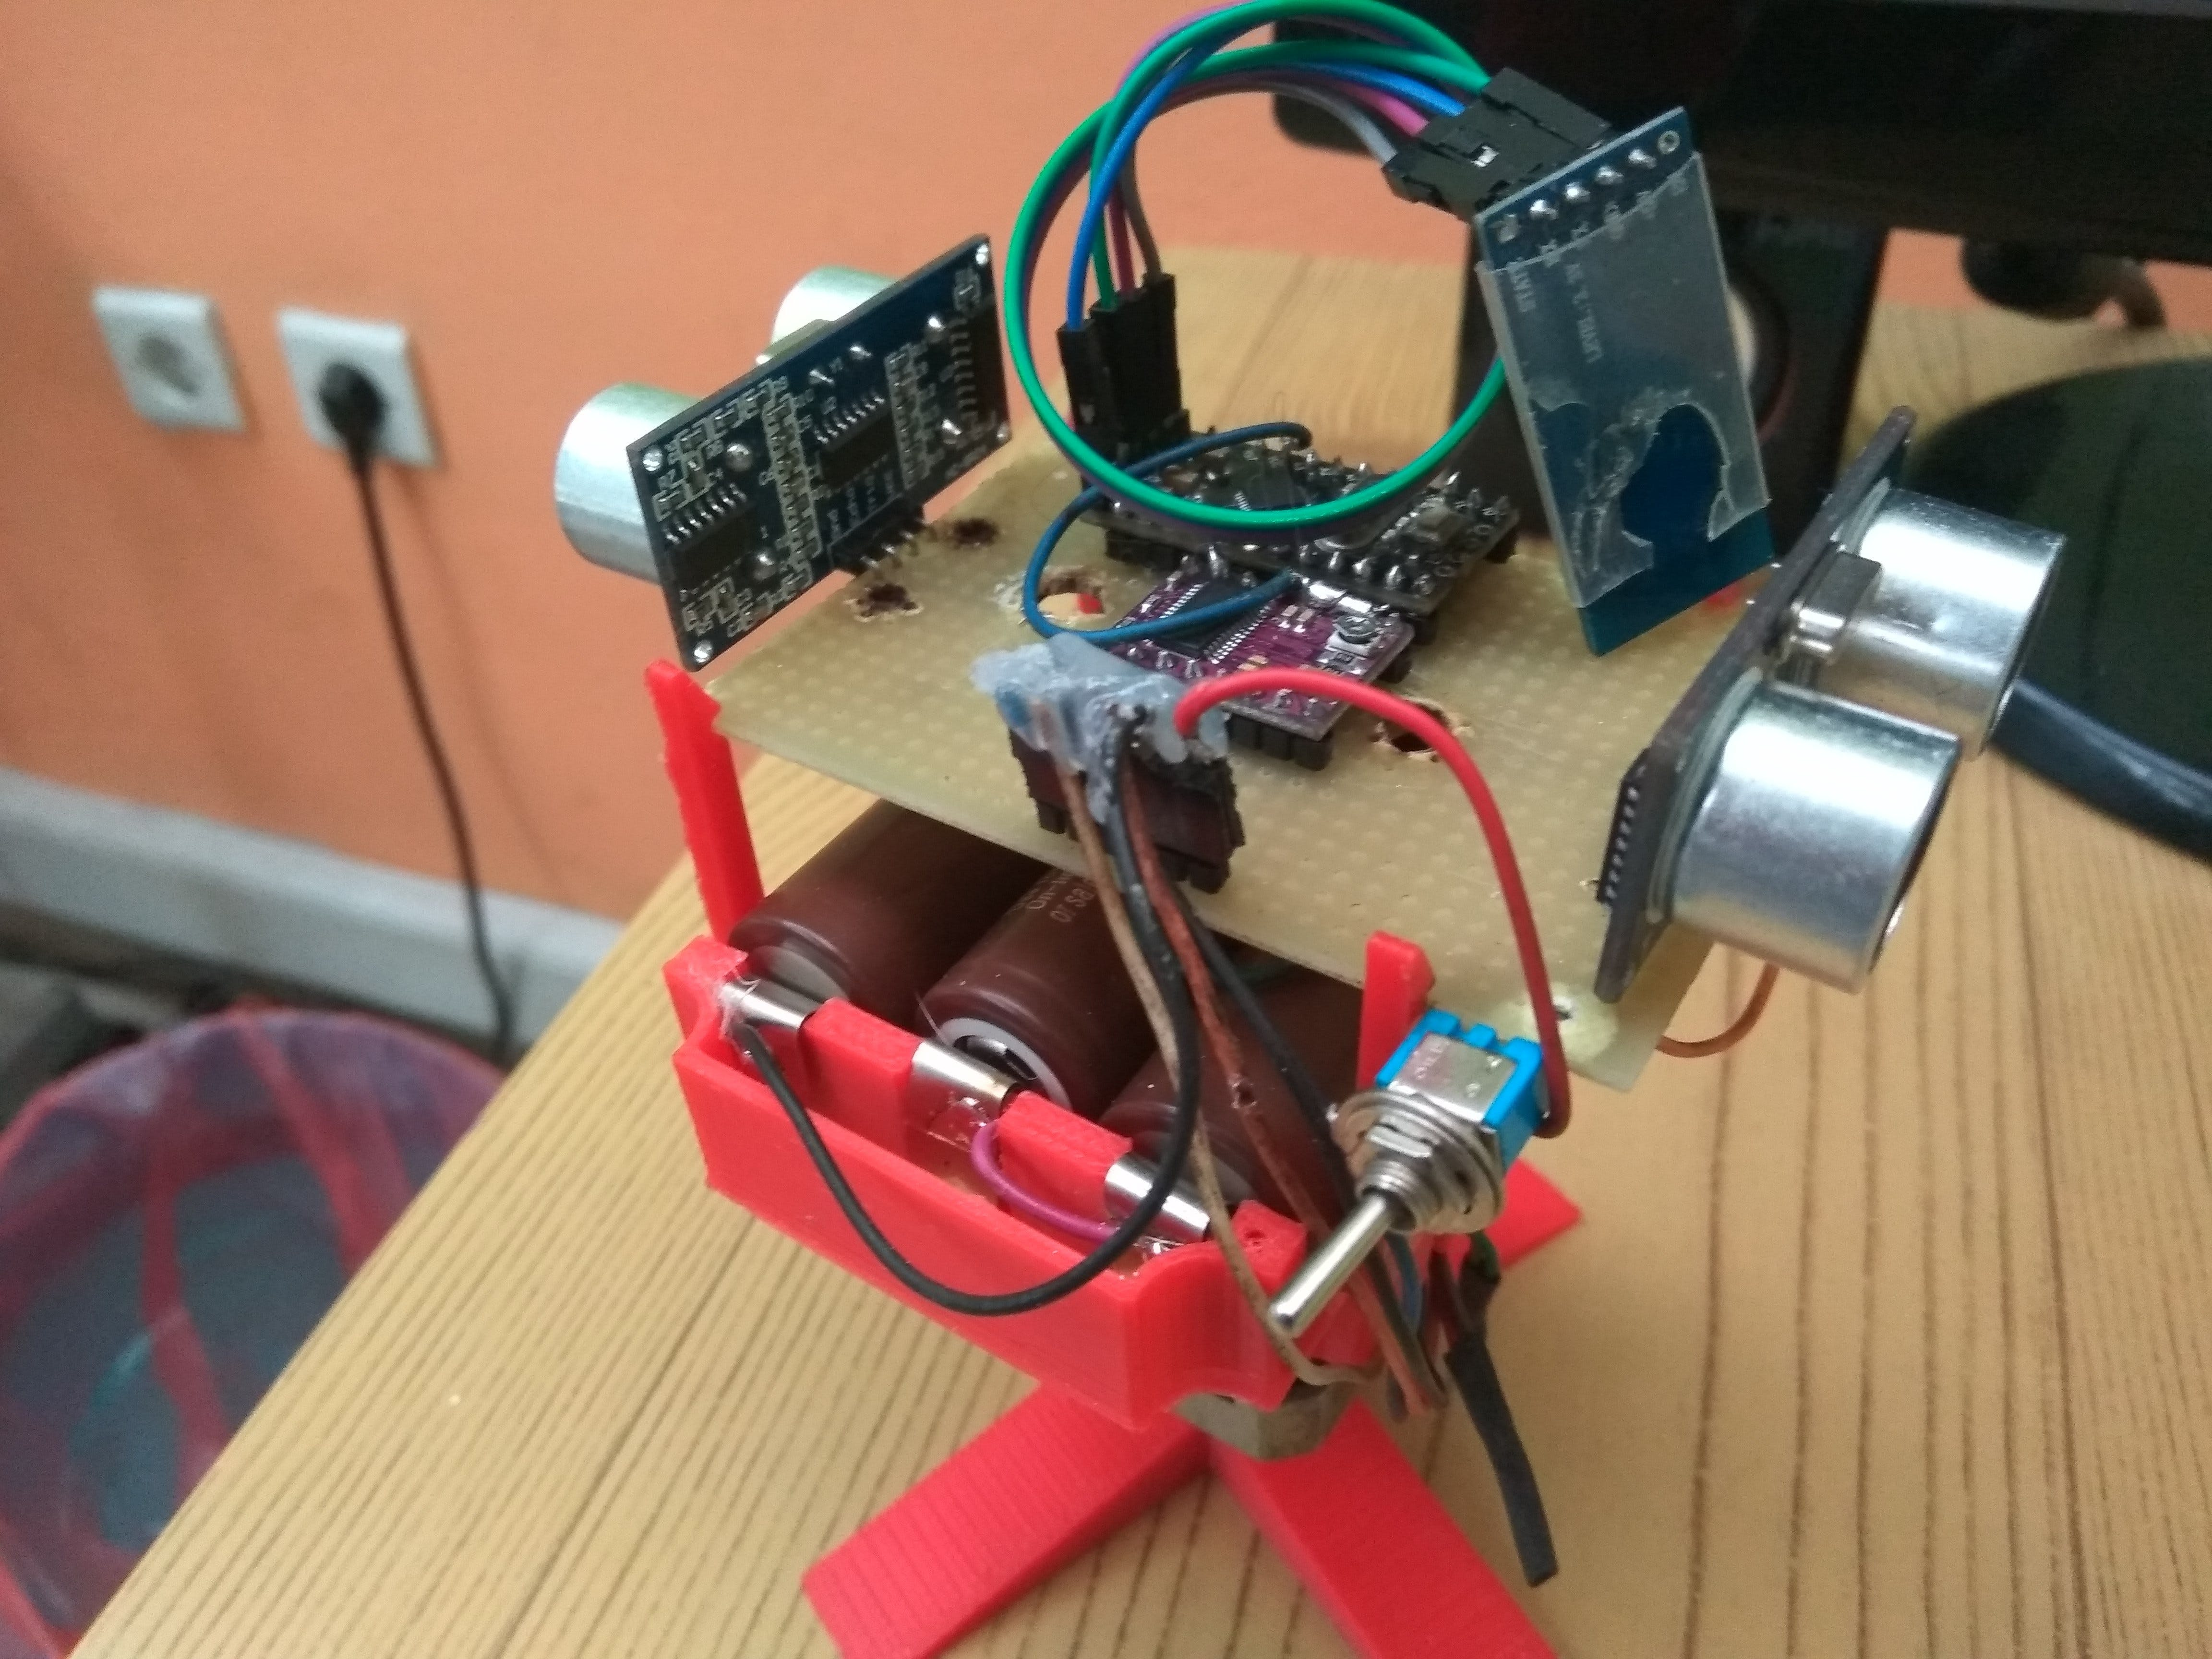 Two Ultrasonic Sensor Arduino Radar - Continuous Rotation